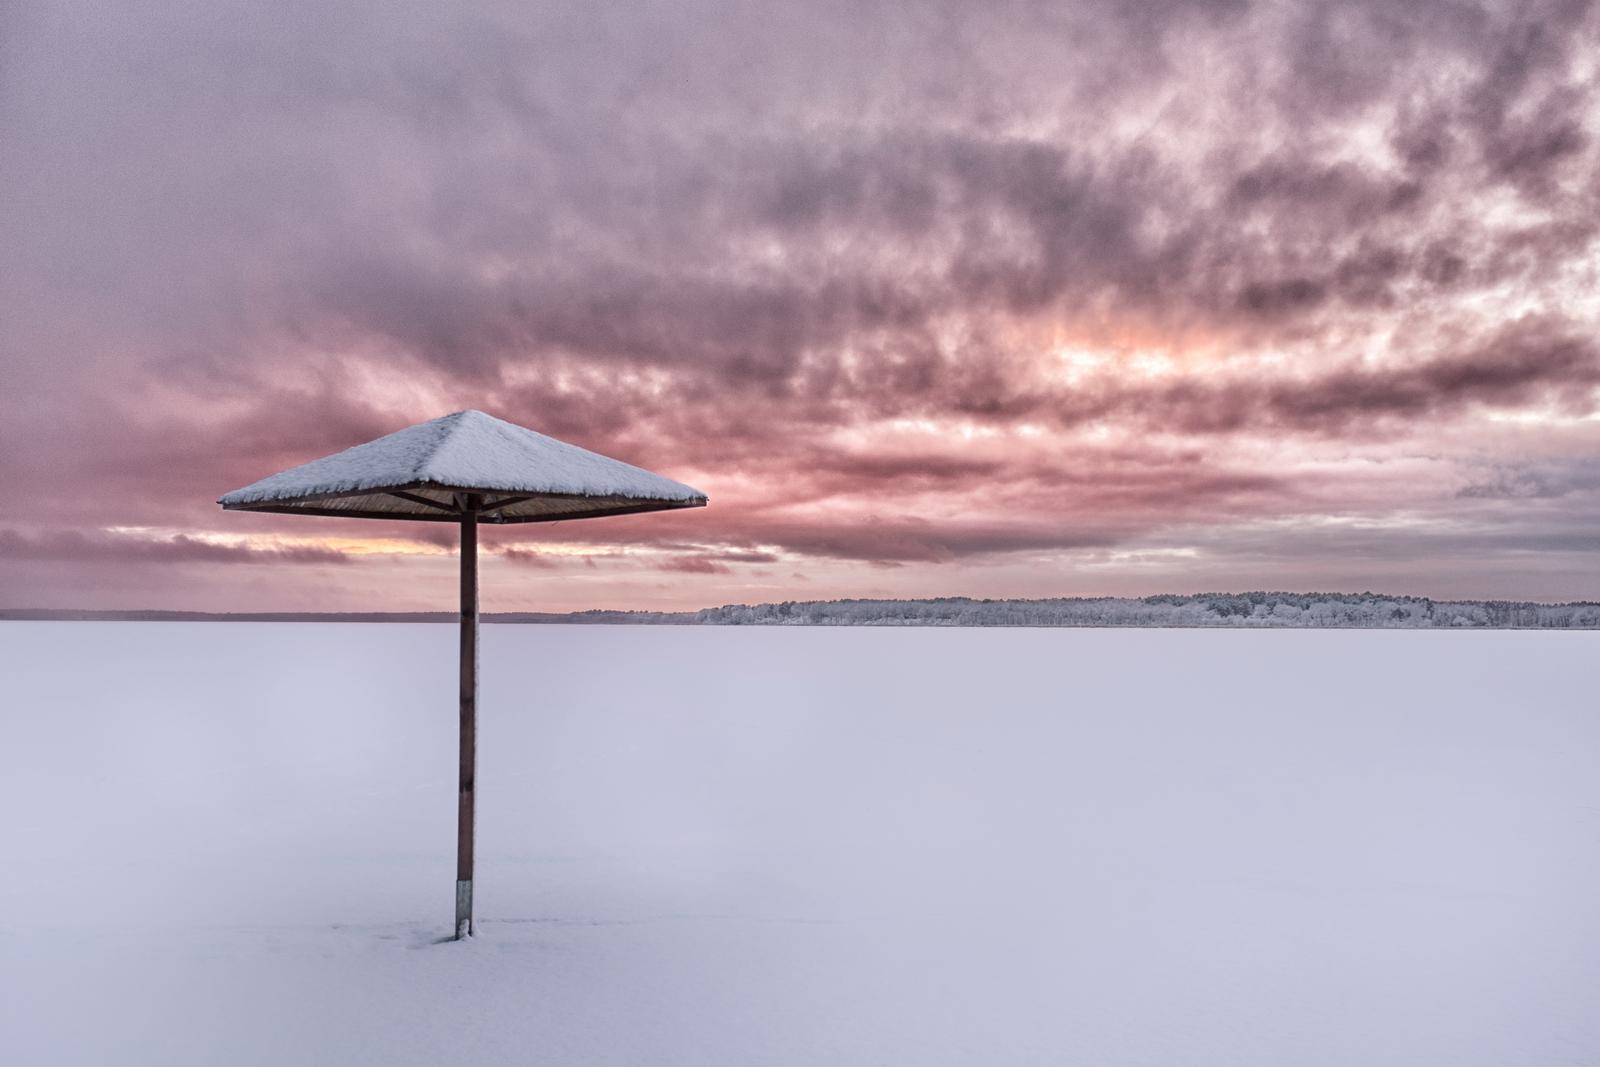 Nowowarpieńskie Sunset –beach and the frozen lake Nowowarpieńskie just after the snowfall on Sunset. Fuji X100s, 1/100s, f8, ISO 200